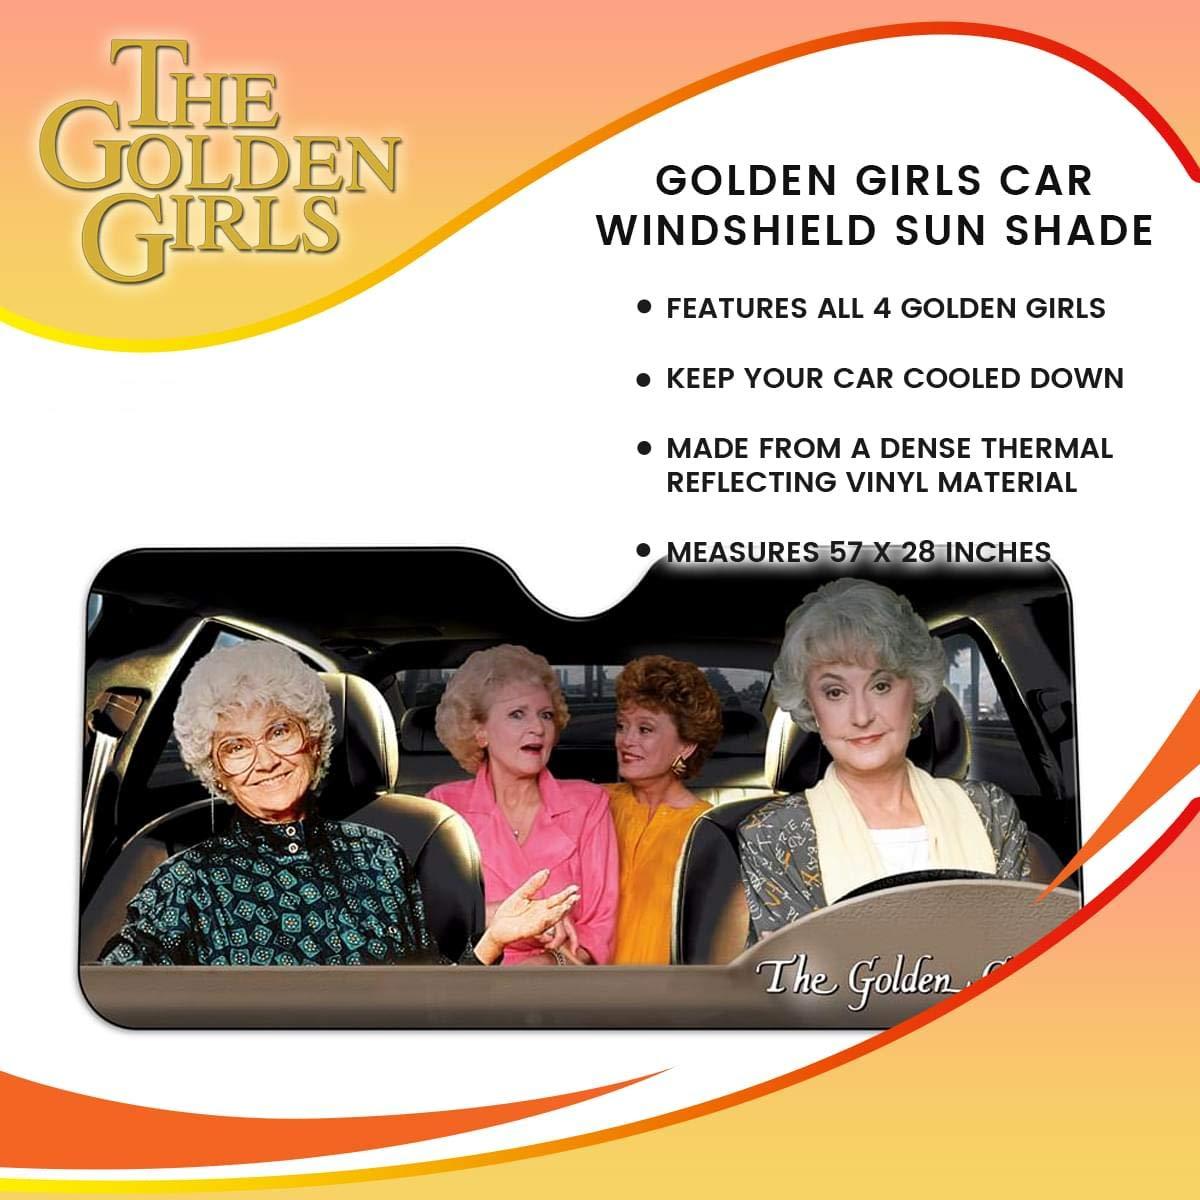 the golden girls windshield sun shade details